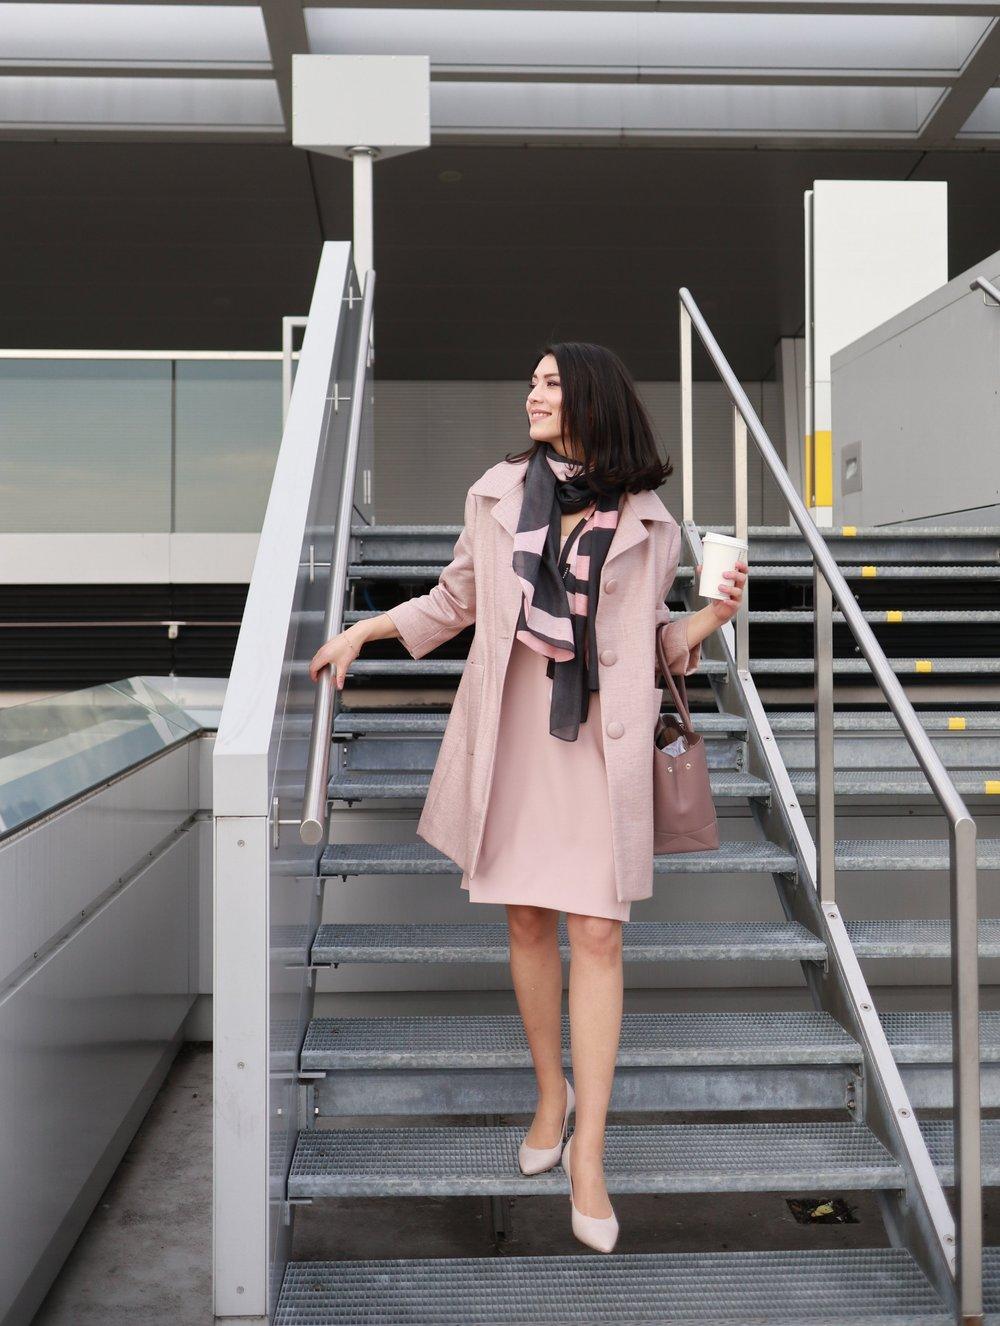 Das perfekte Business Casual Outfit für den Frühling gefunden bei PKZ Women Zürich.(Foto: Moritz Schmid)